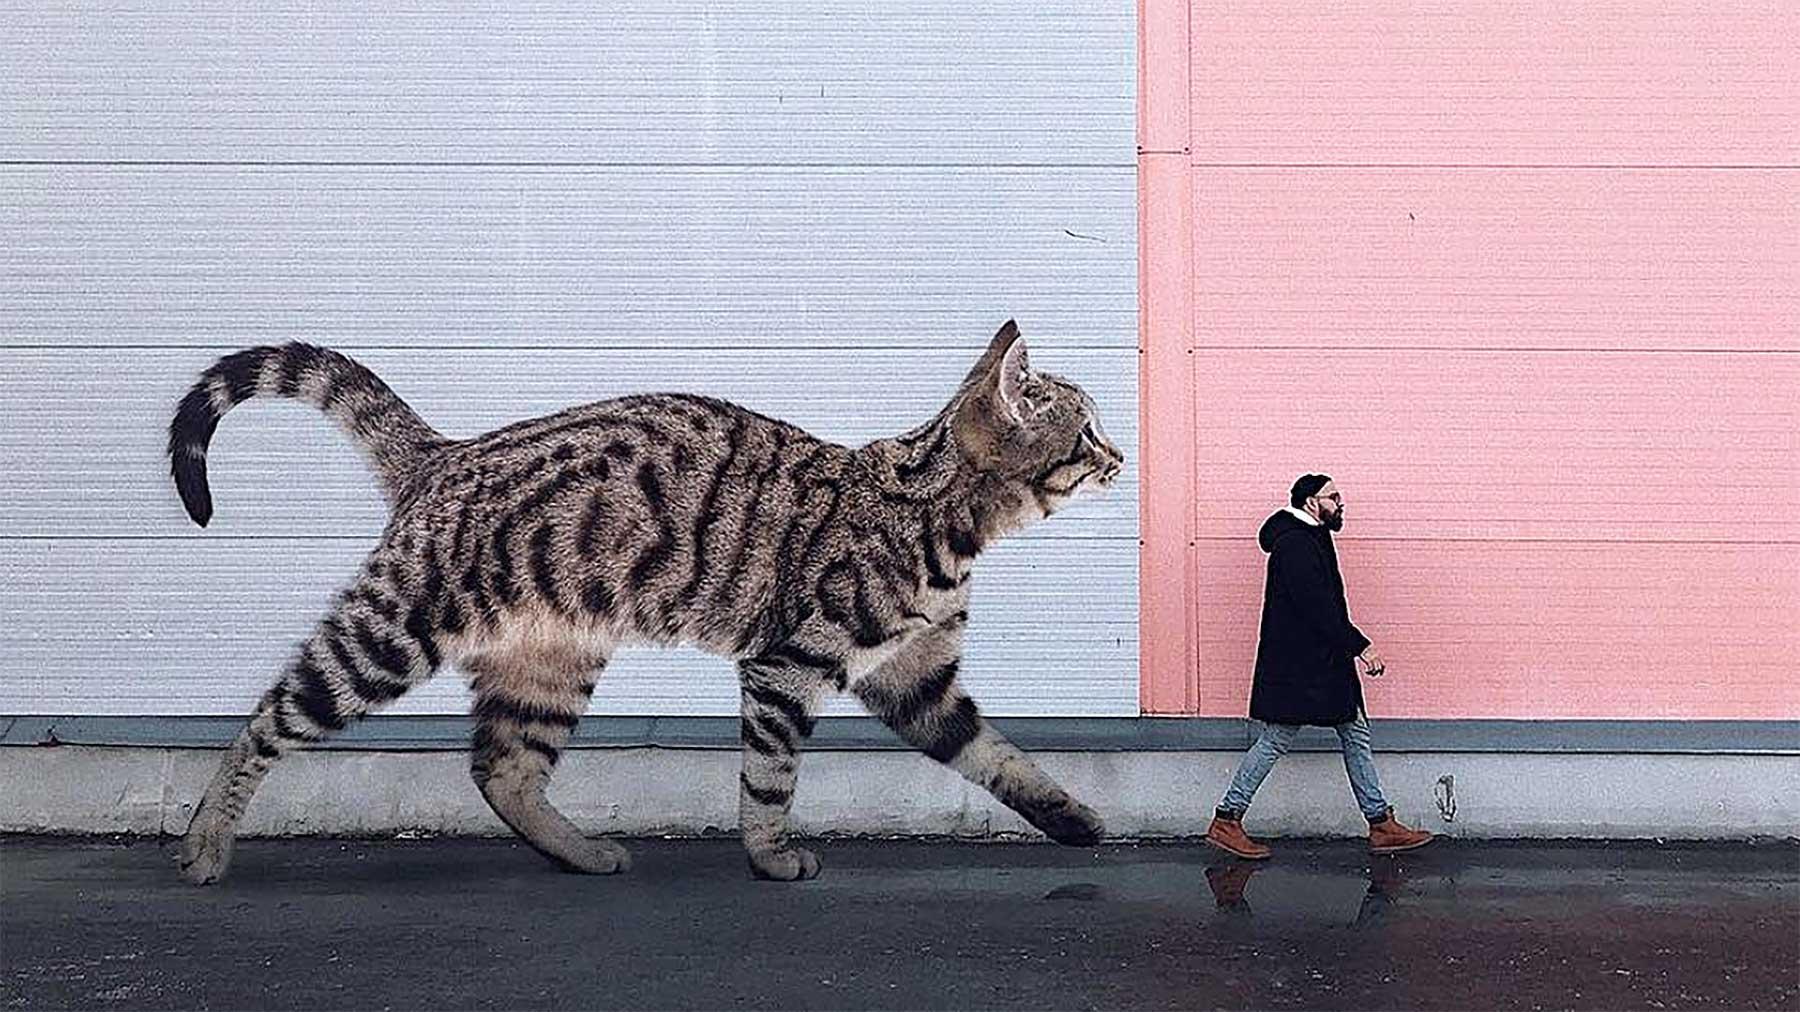 Wenn Katzen riesig wären